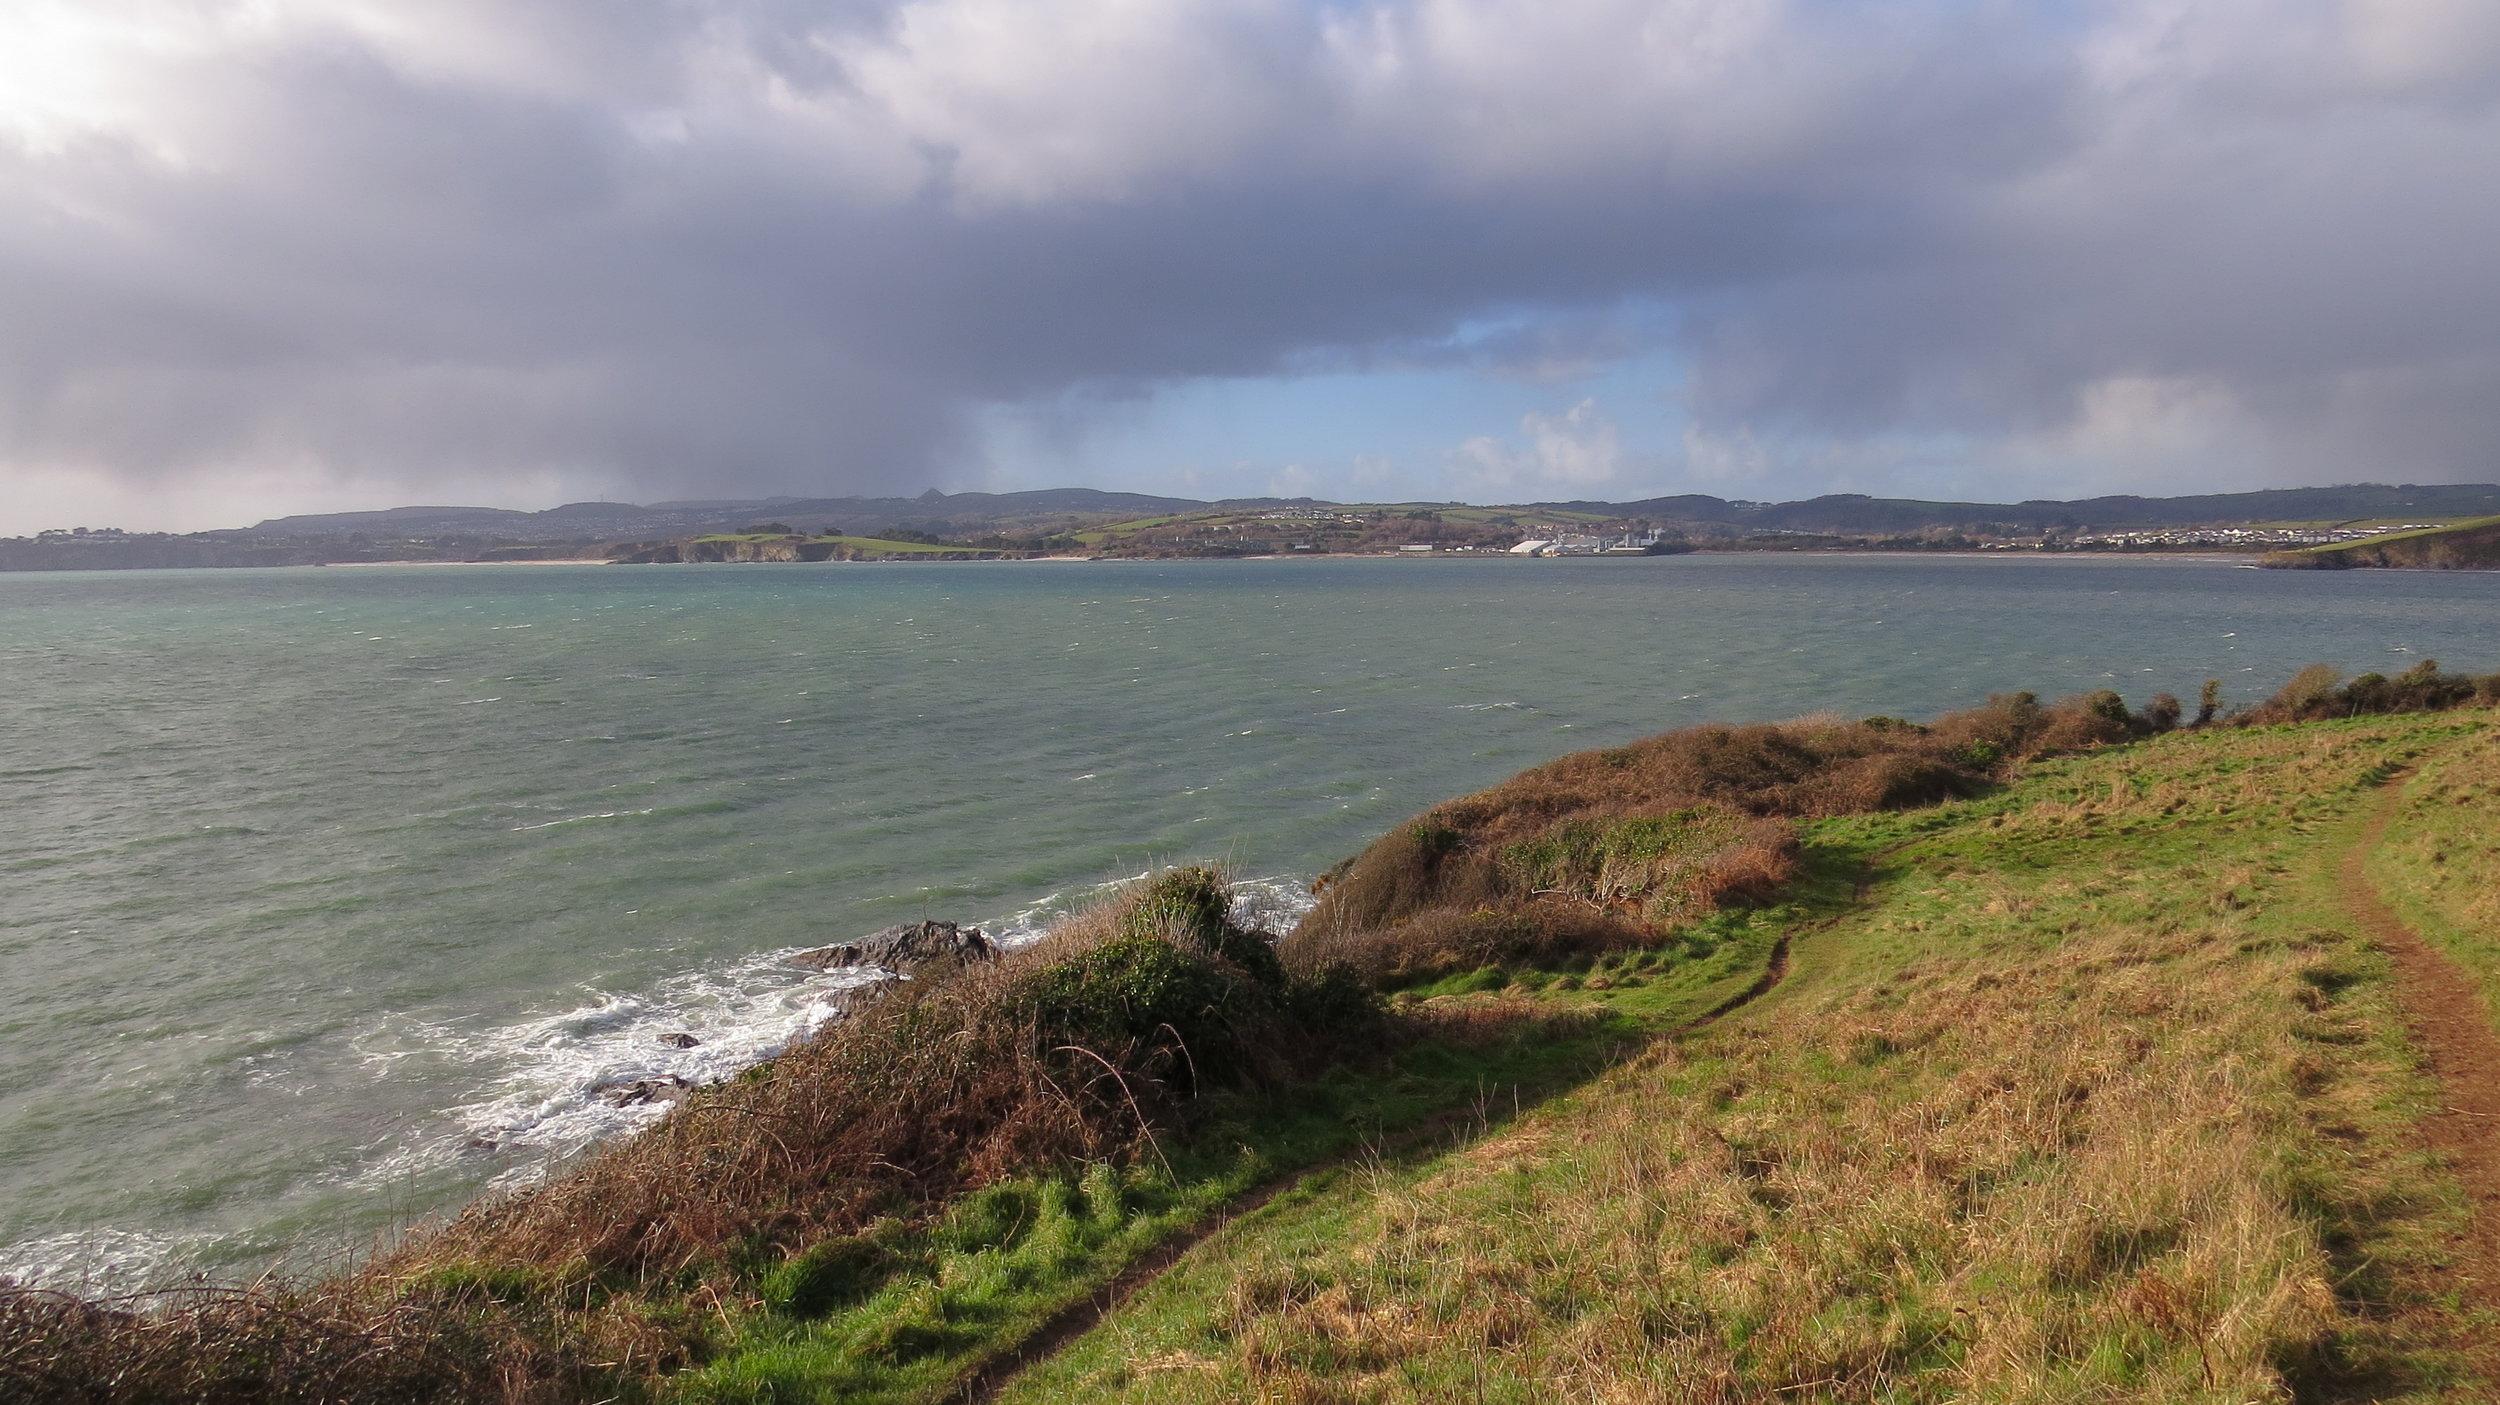 St Austell Bay